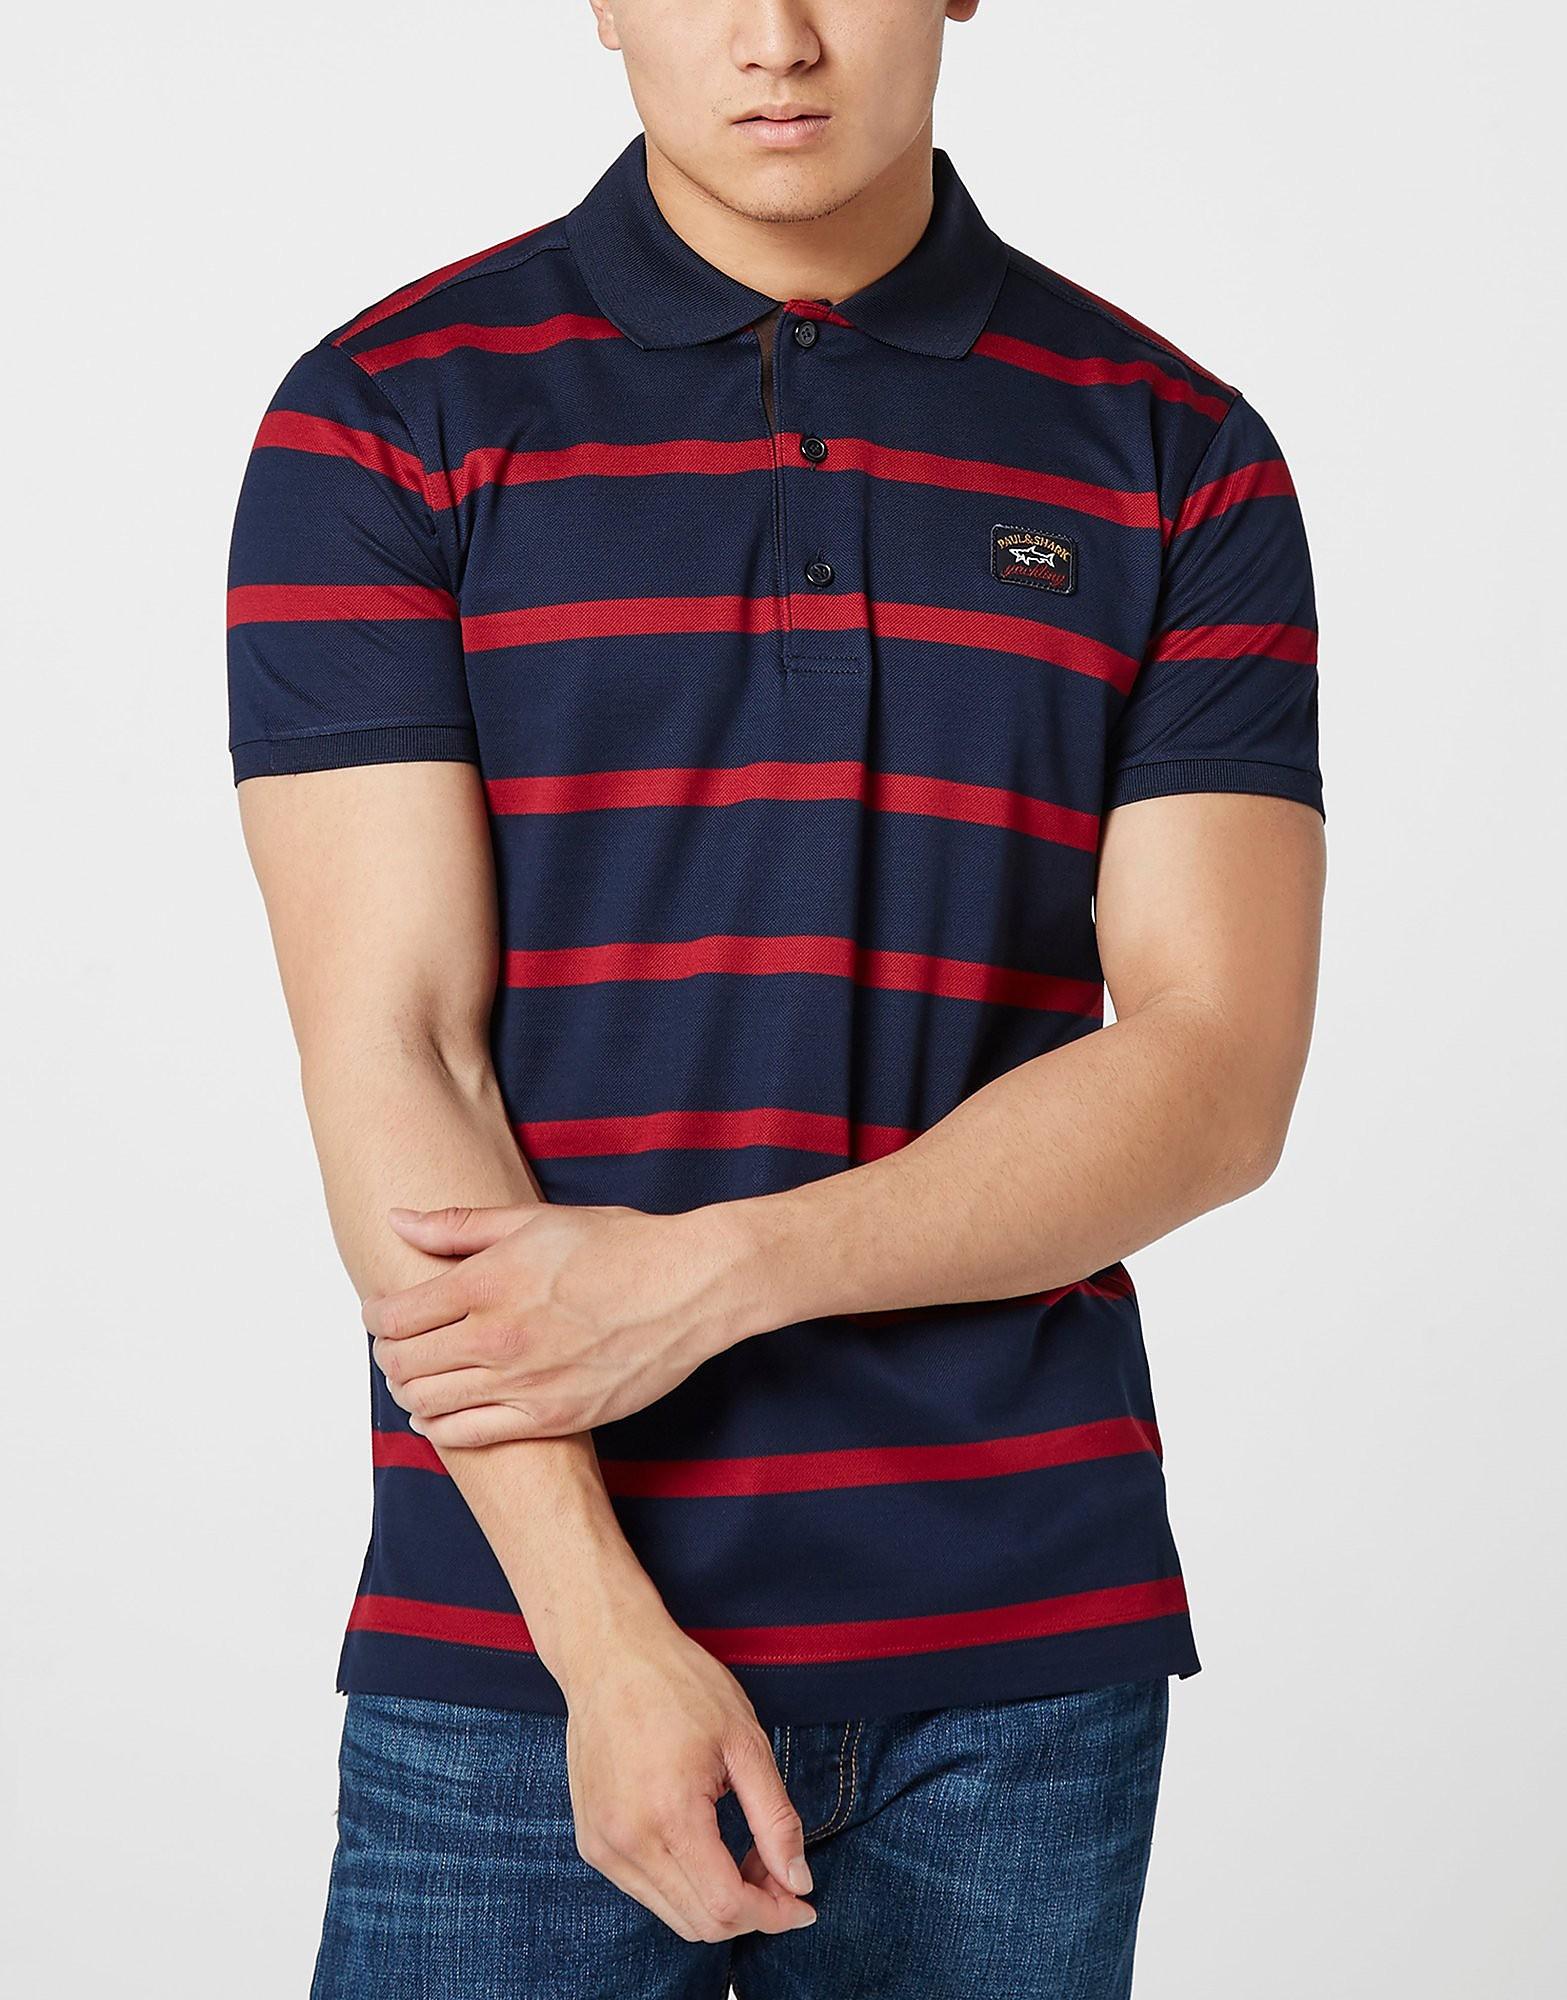 Paul and Shark Thin Stripe Polo Shirt